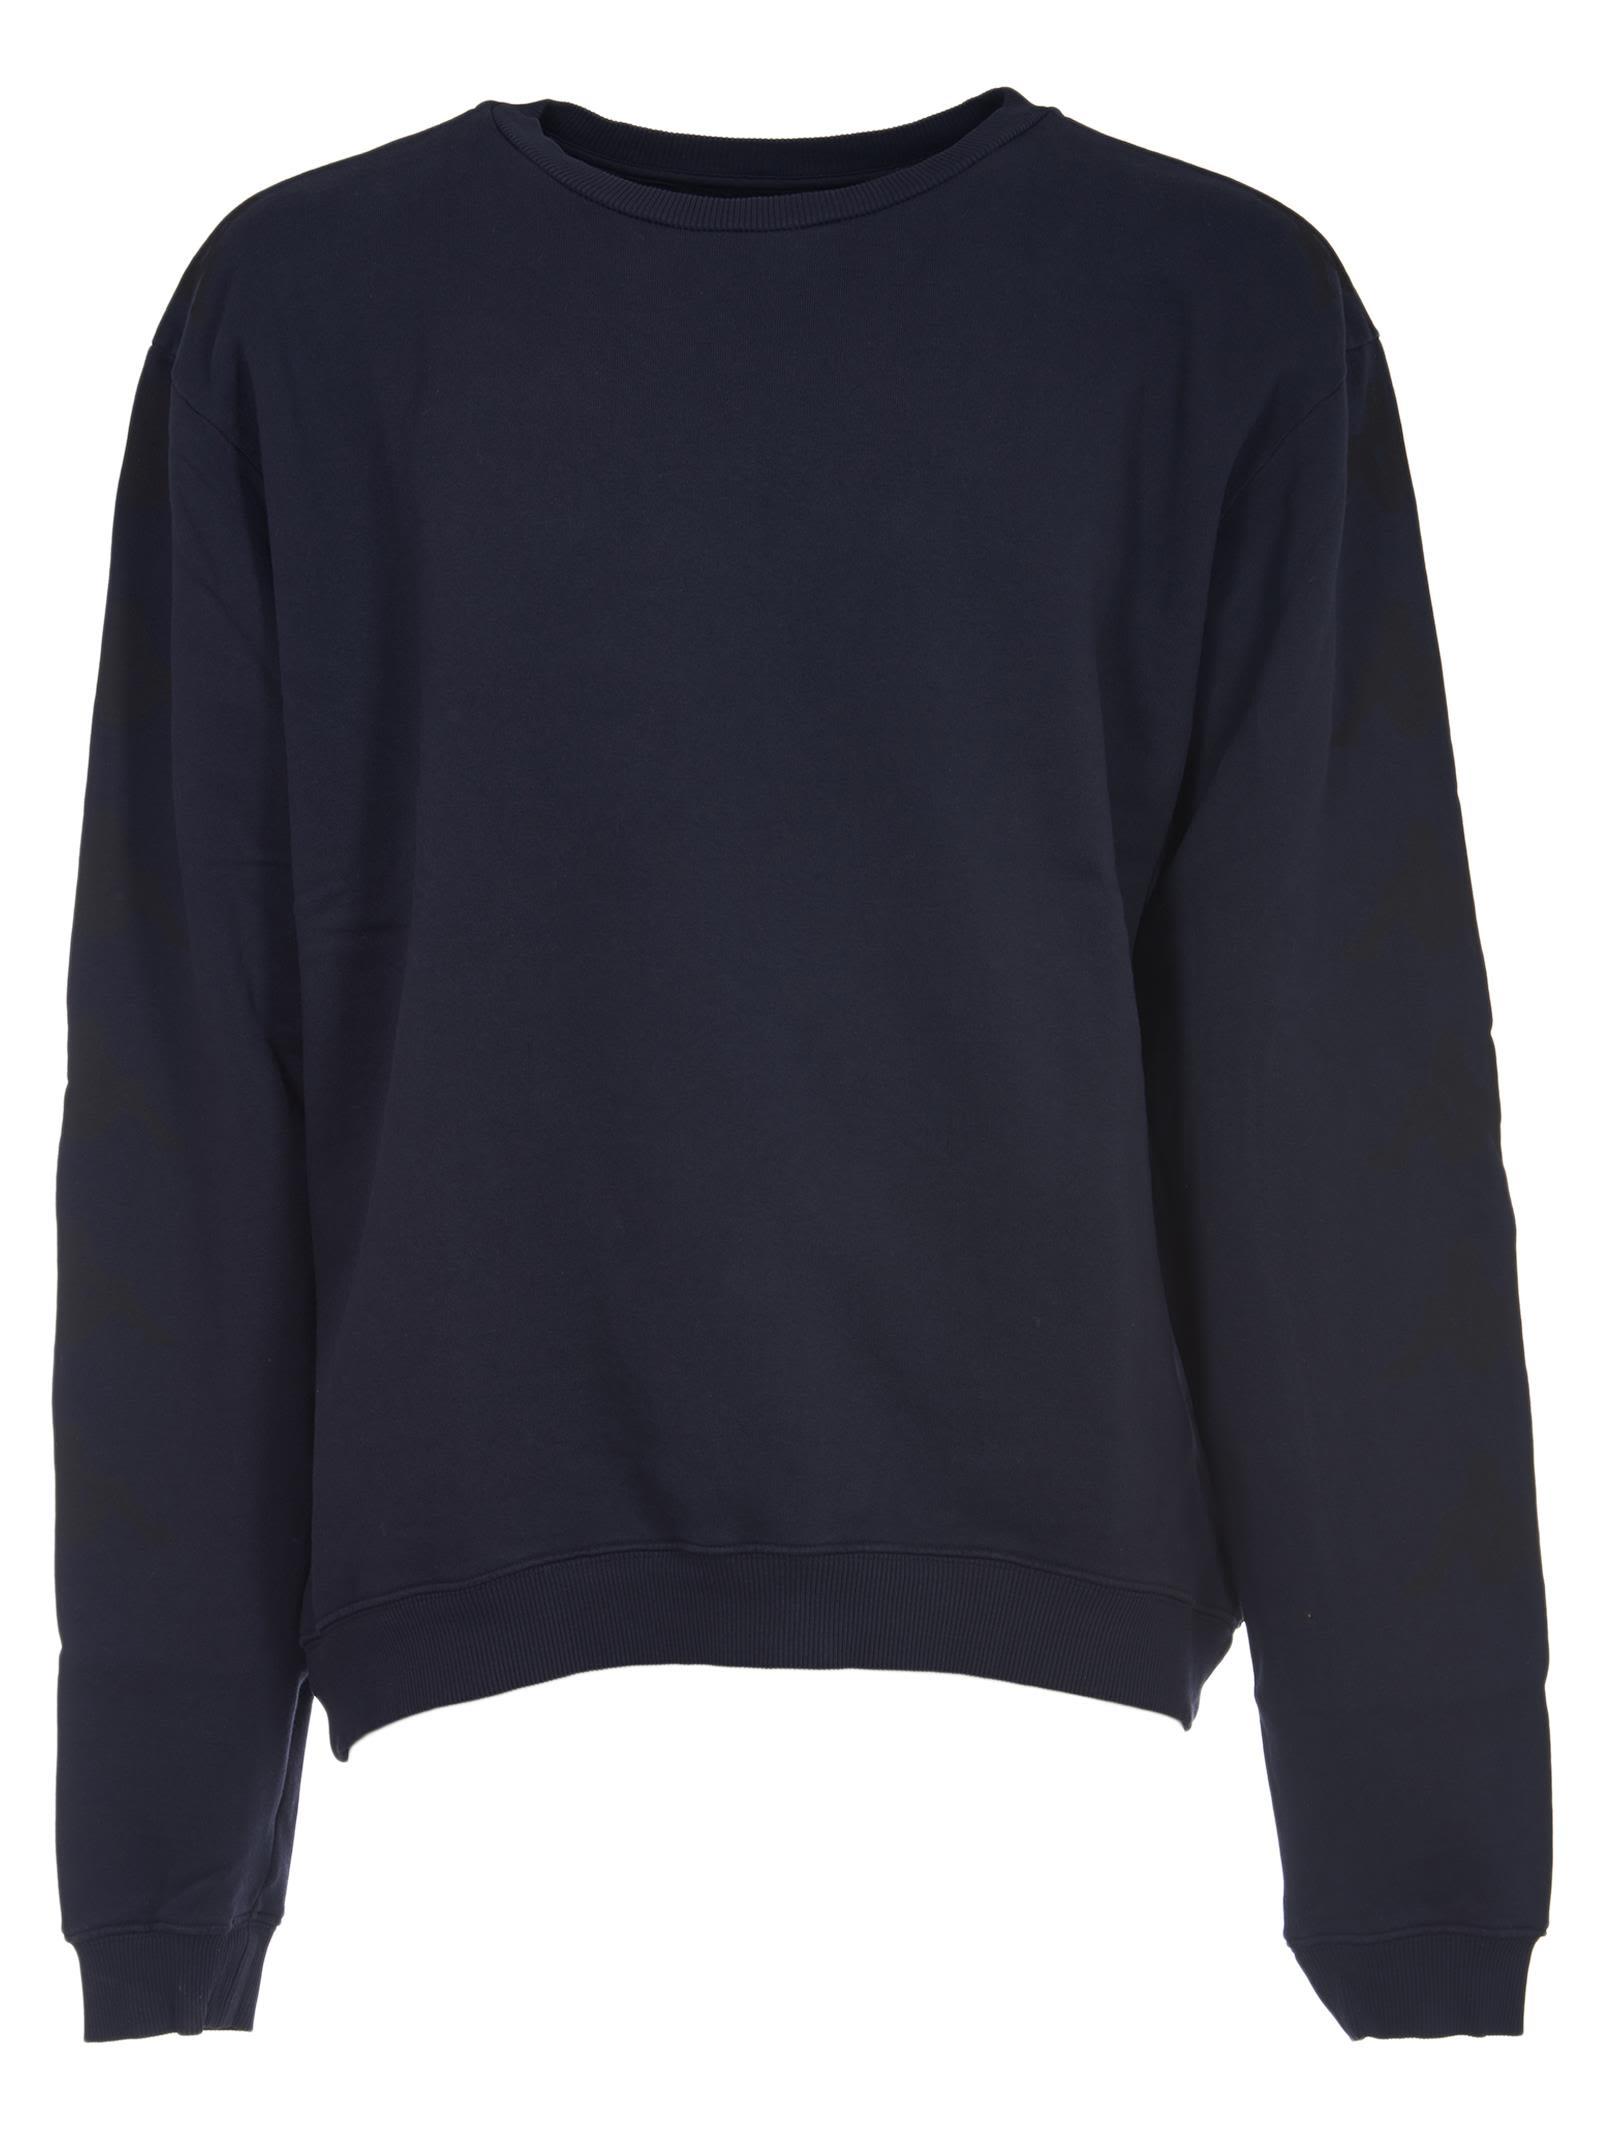 DANILO PAURA Classic Sweatshirt in Blue Navy